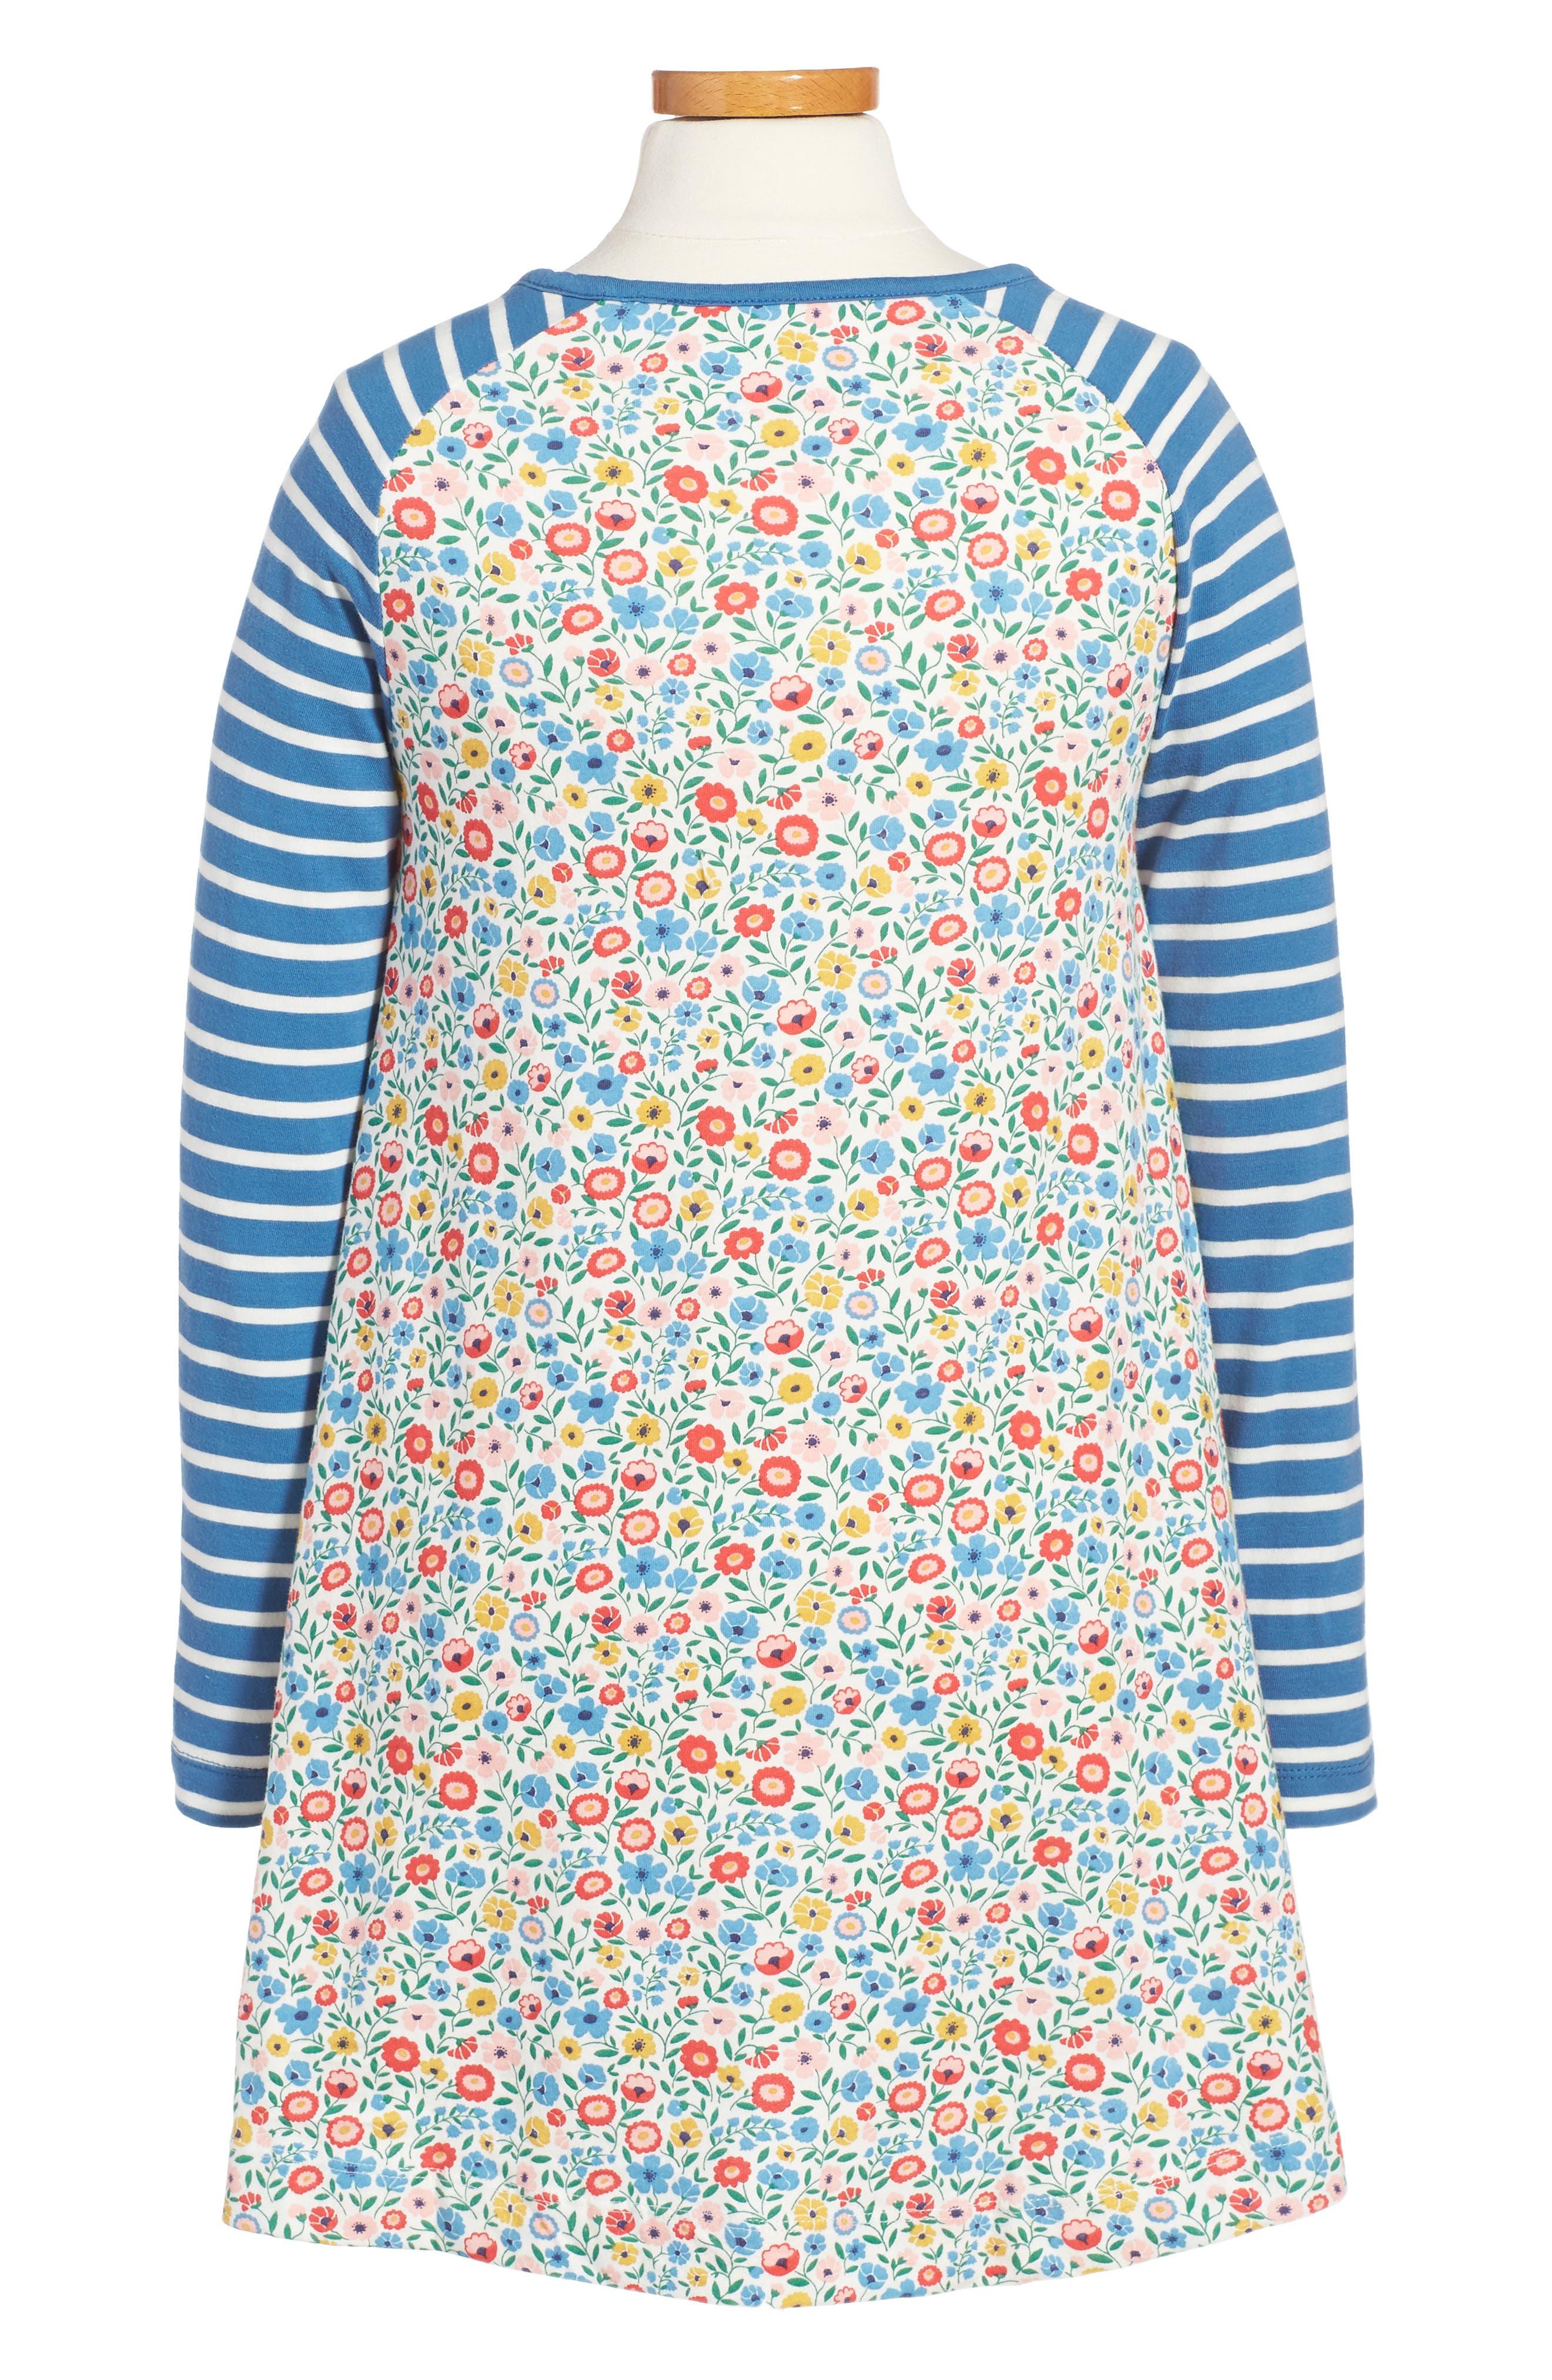 Jersey Swing Dress,                             Alternate thumbnail 2, color,                             902